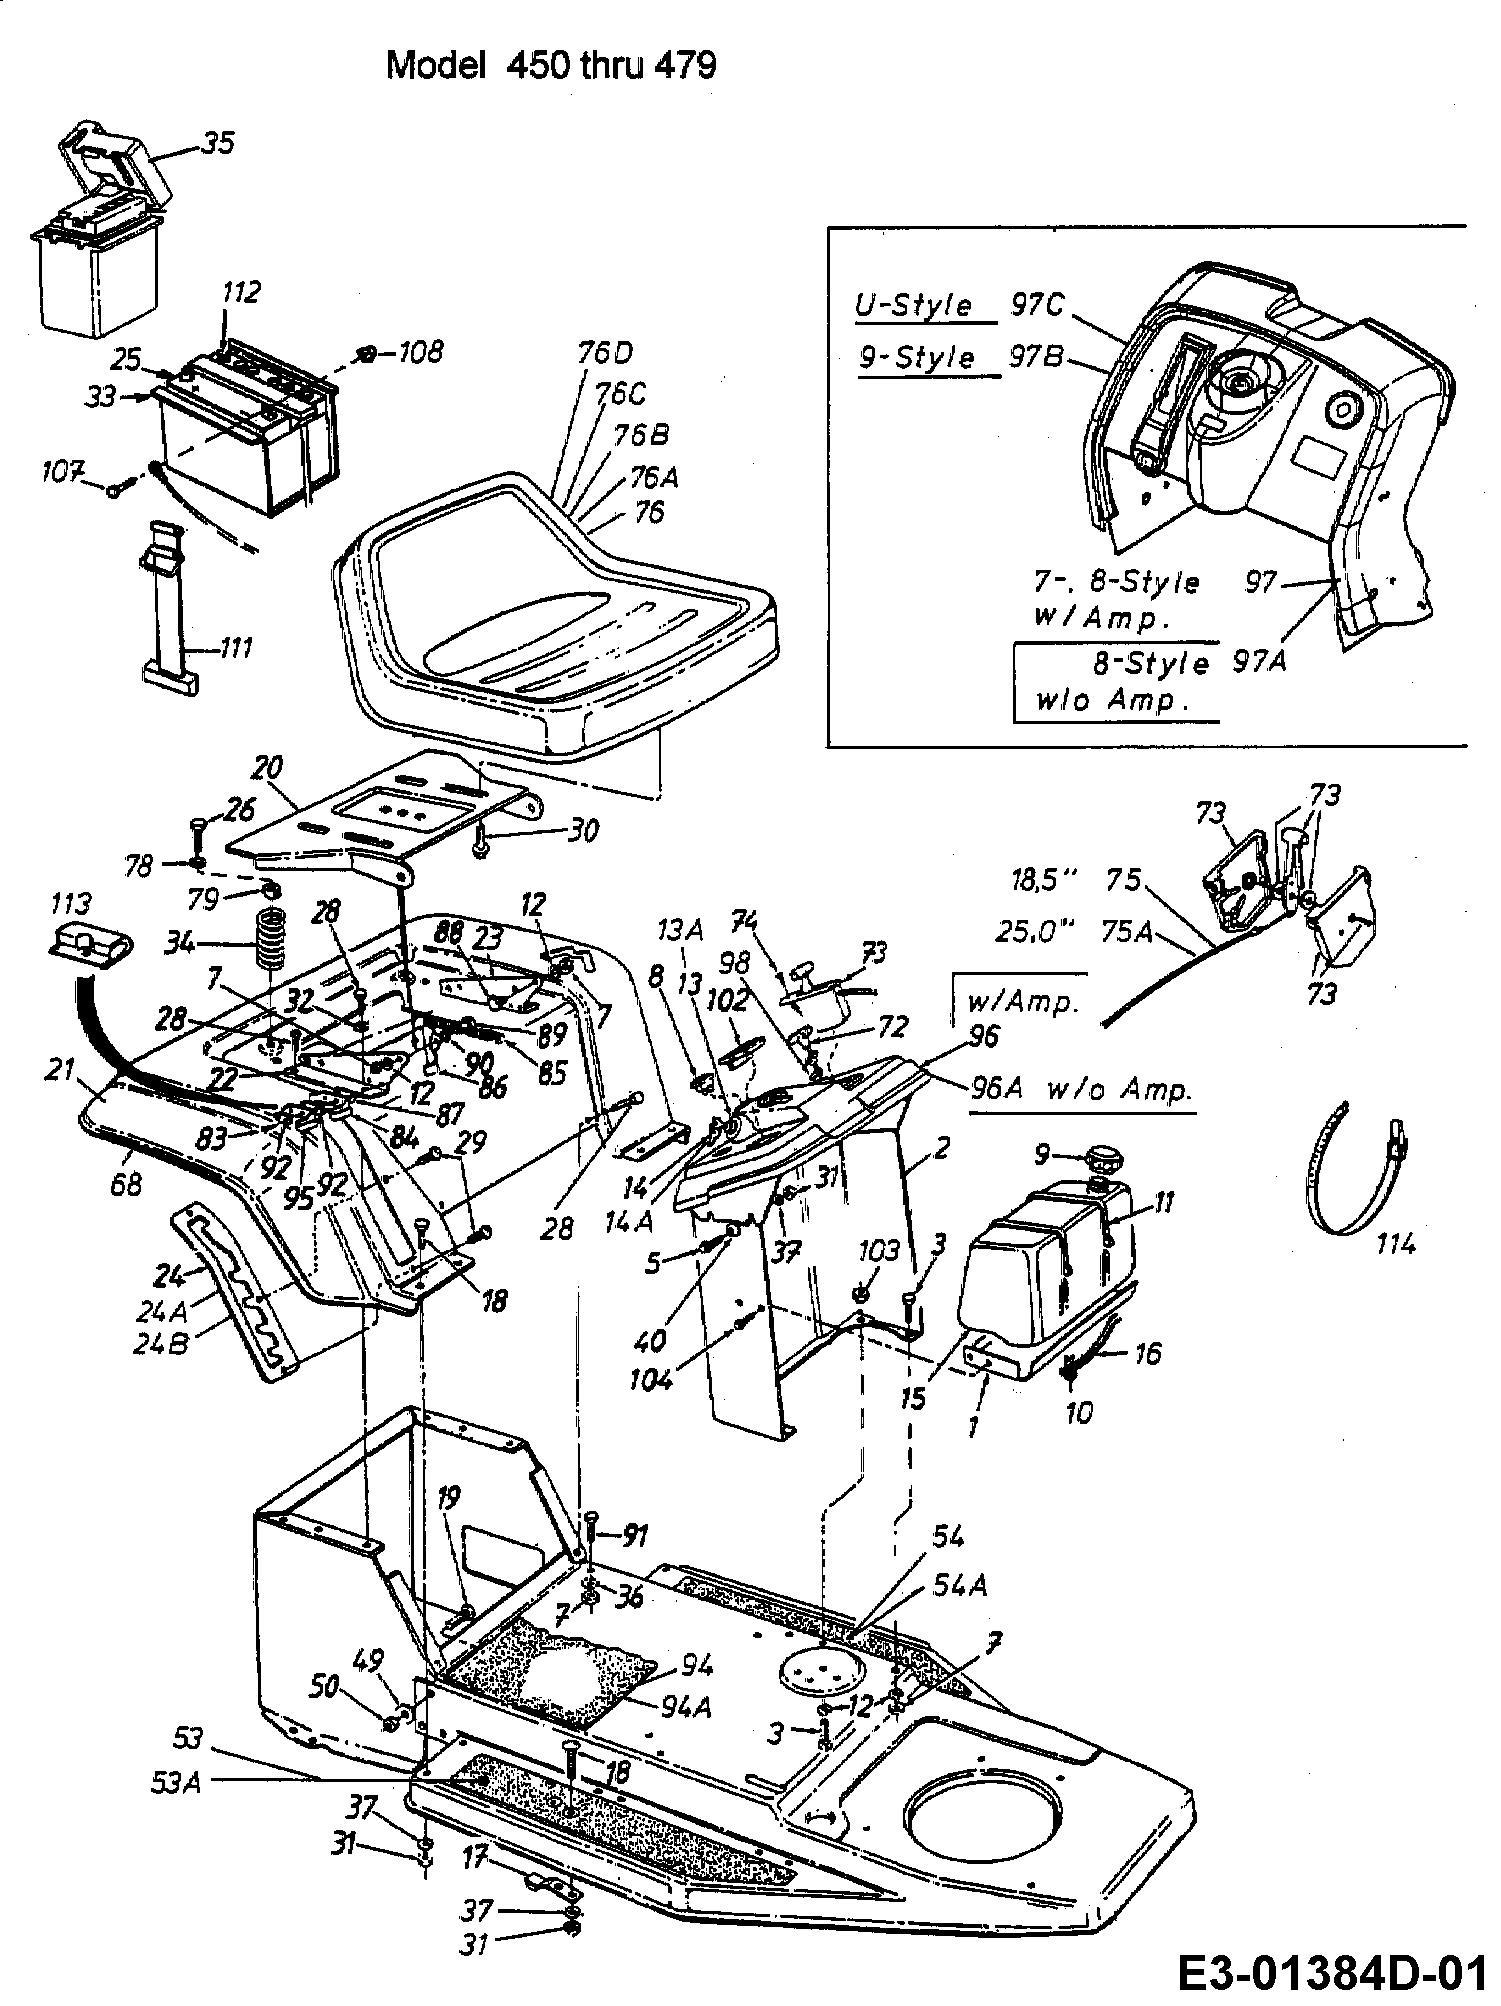 mtd yardman wiring diagram 2006 kia sorento mtd008073 13ap473a643 1998 lawn tractors